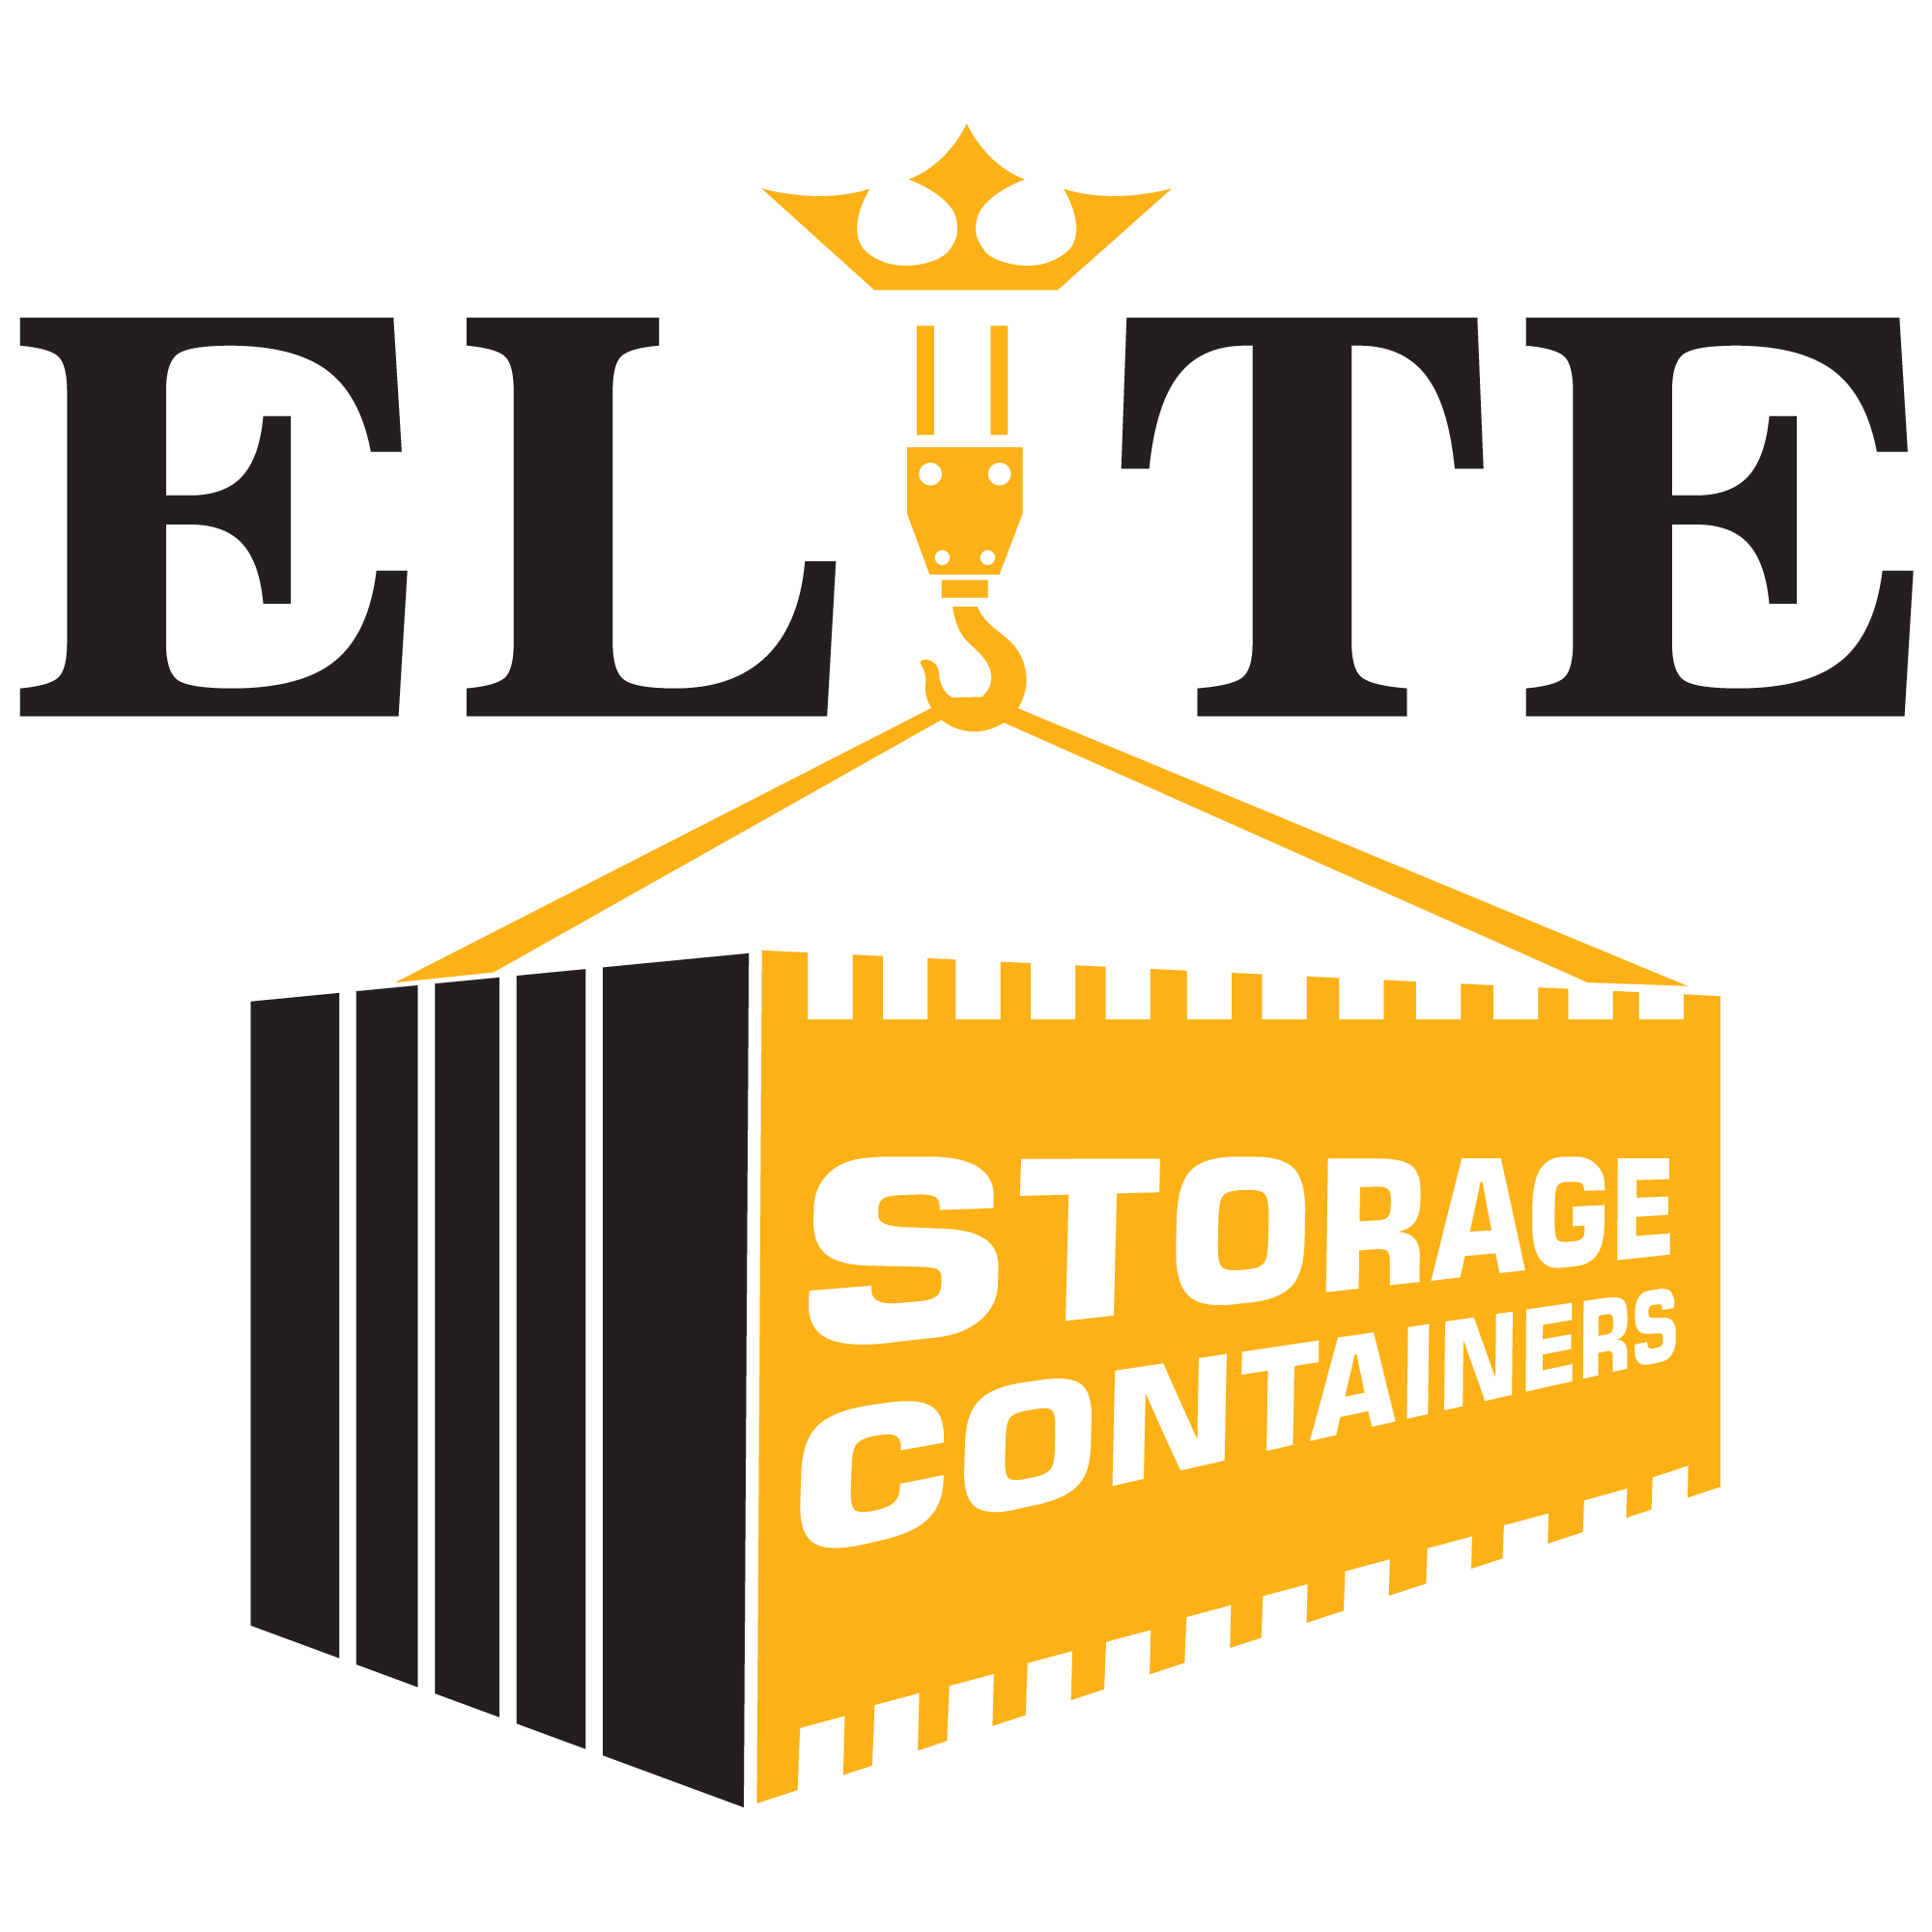 Elite Storage Containers